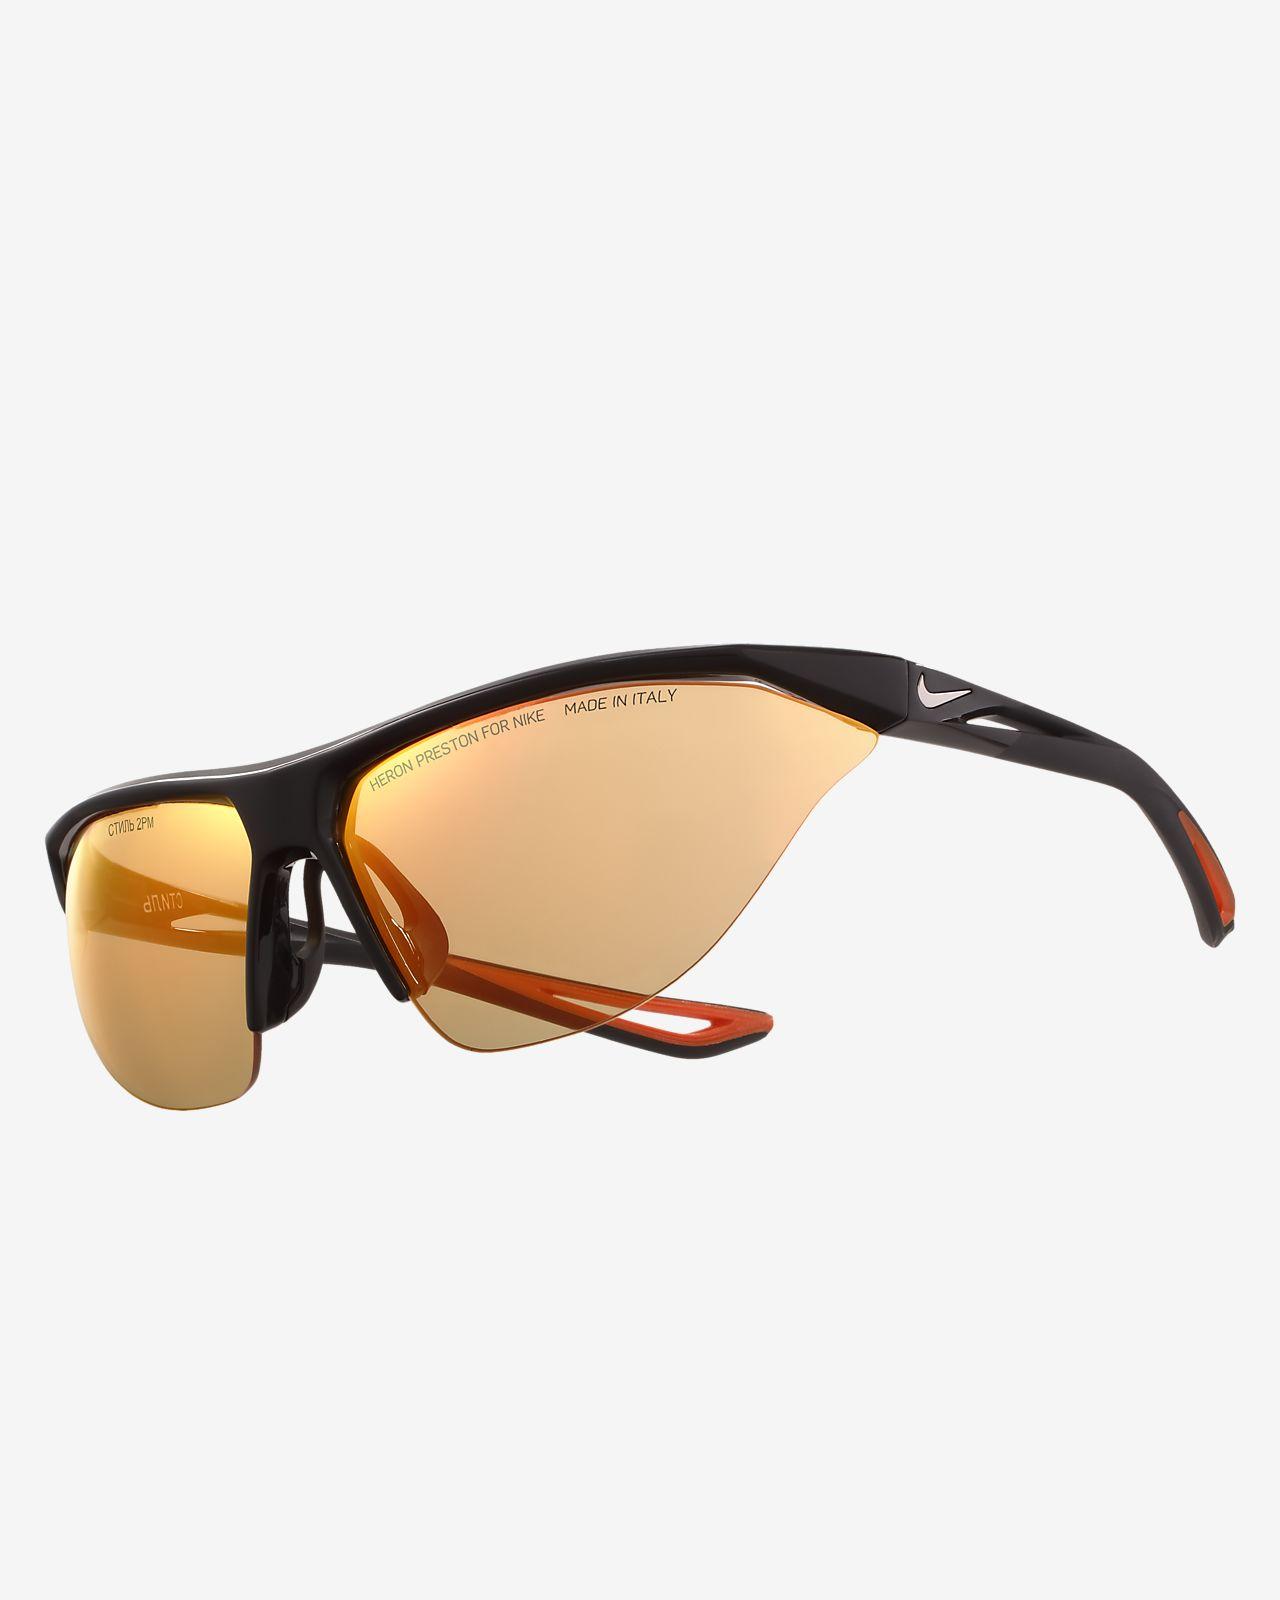 84415d6c0ee Nike x Heron Preston Tailwind Sunglasses. Nike.com